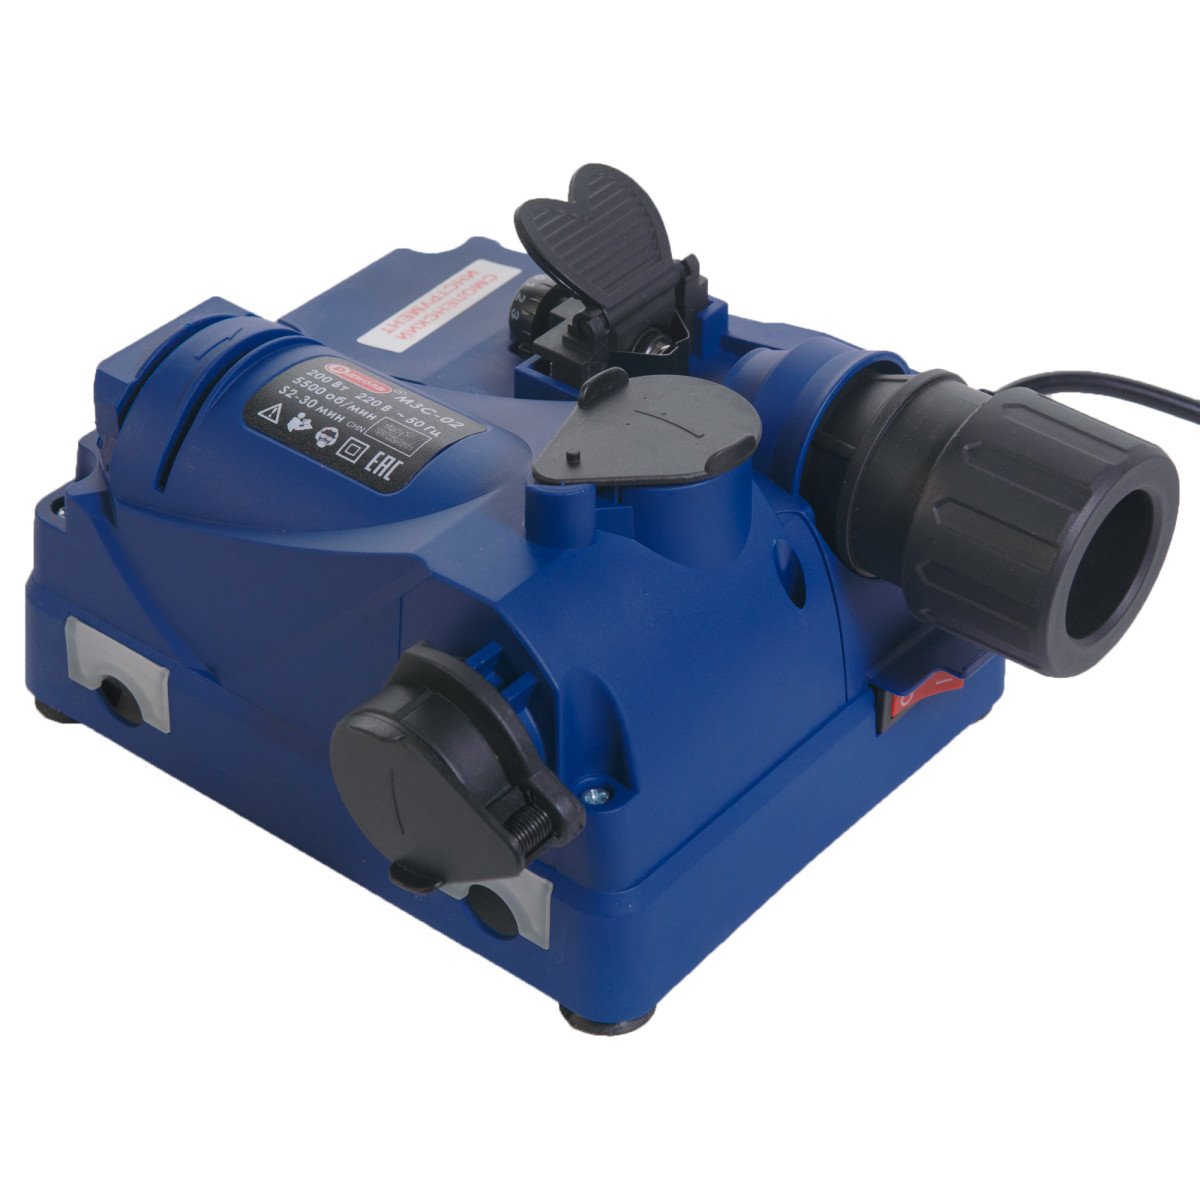 Точильный станок Диолд МЗС-02 200Вт 5500/мин 1.9 кг